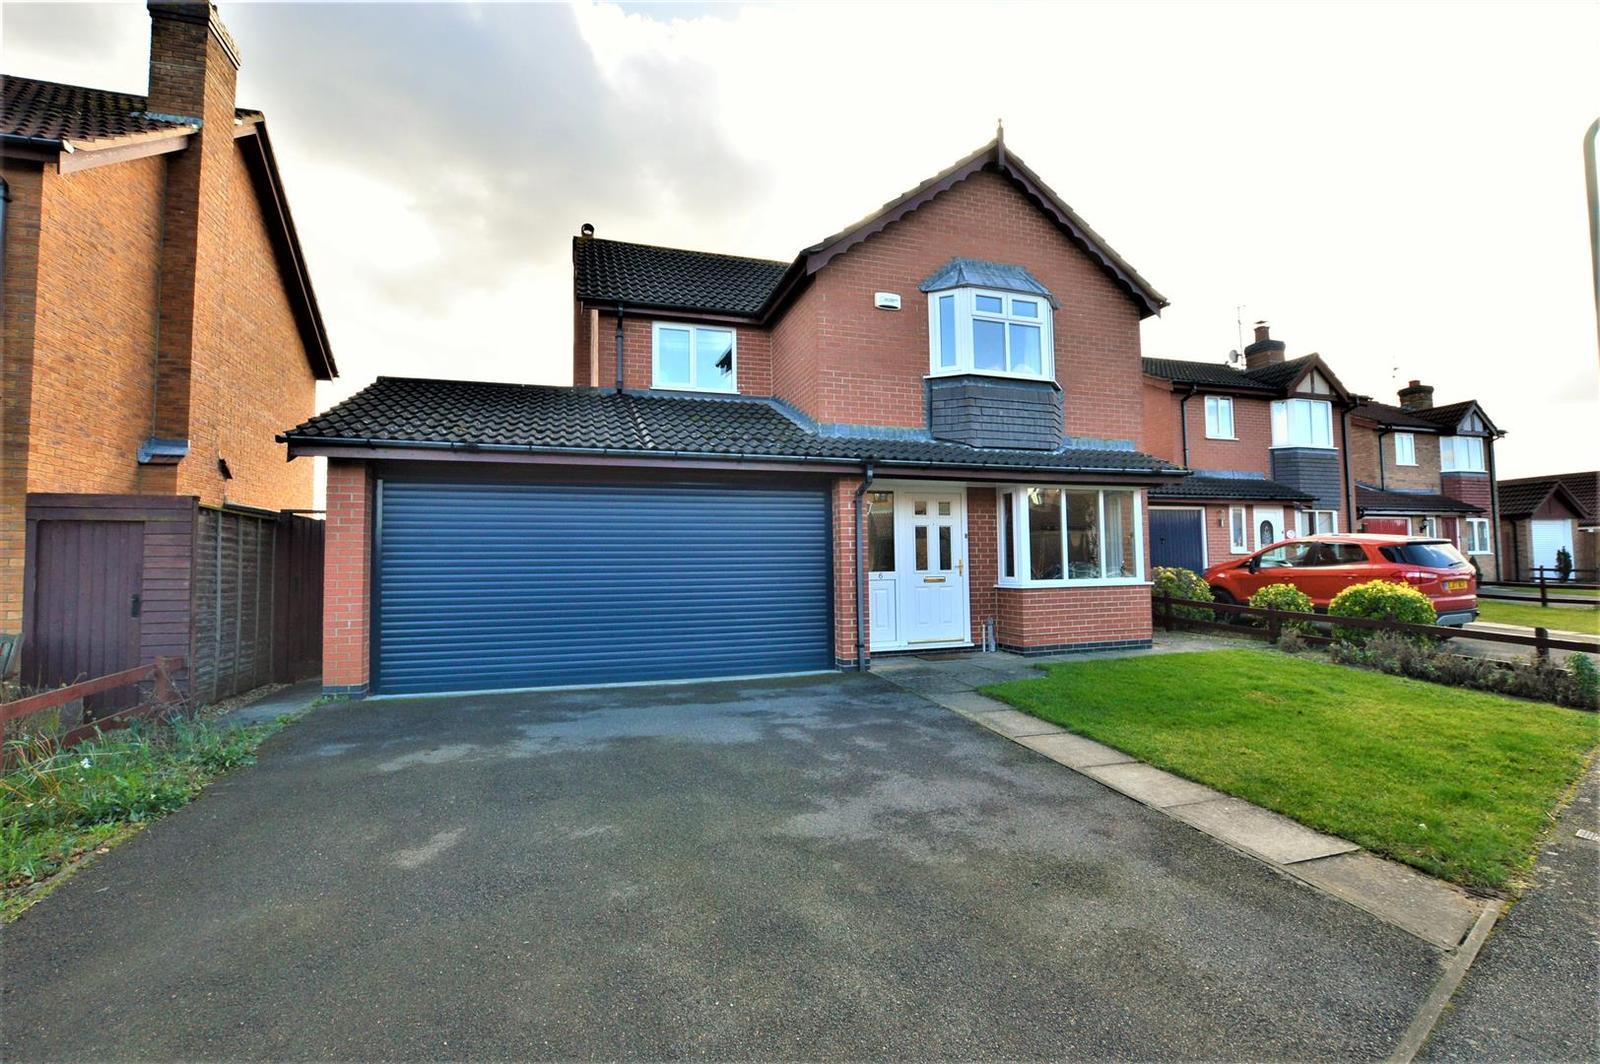 4 Bedrooms Property for sale in Dunlin Road, Essendine, Stamford